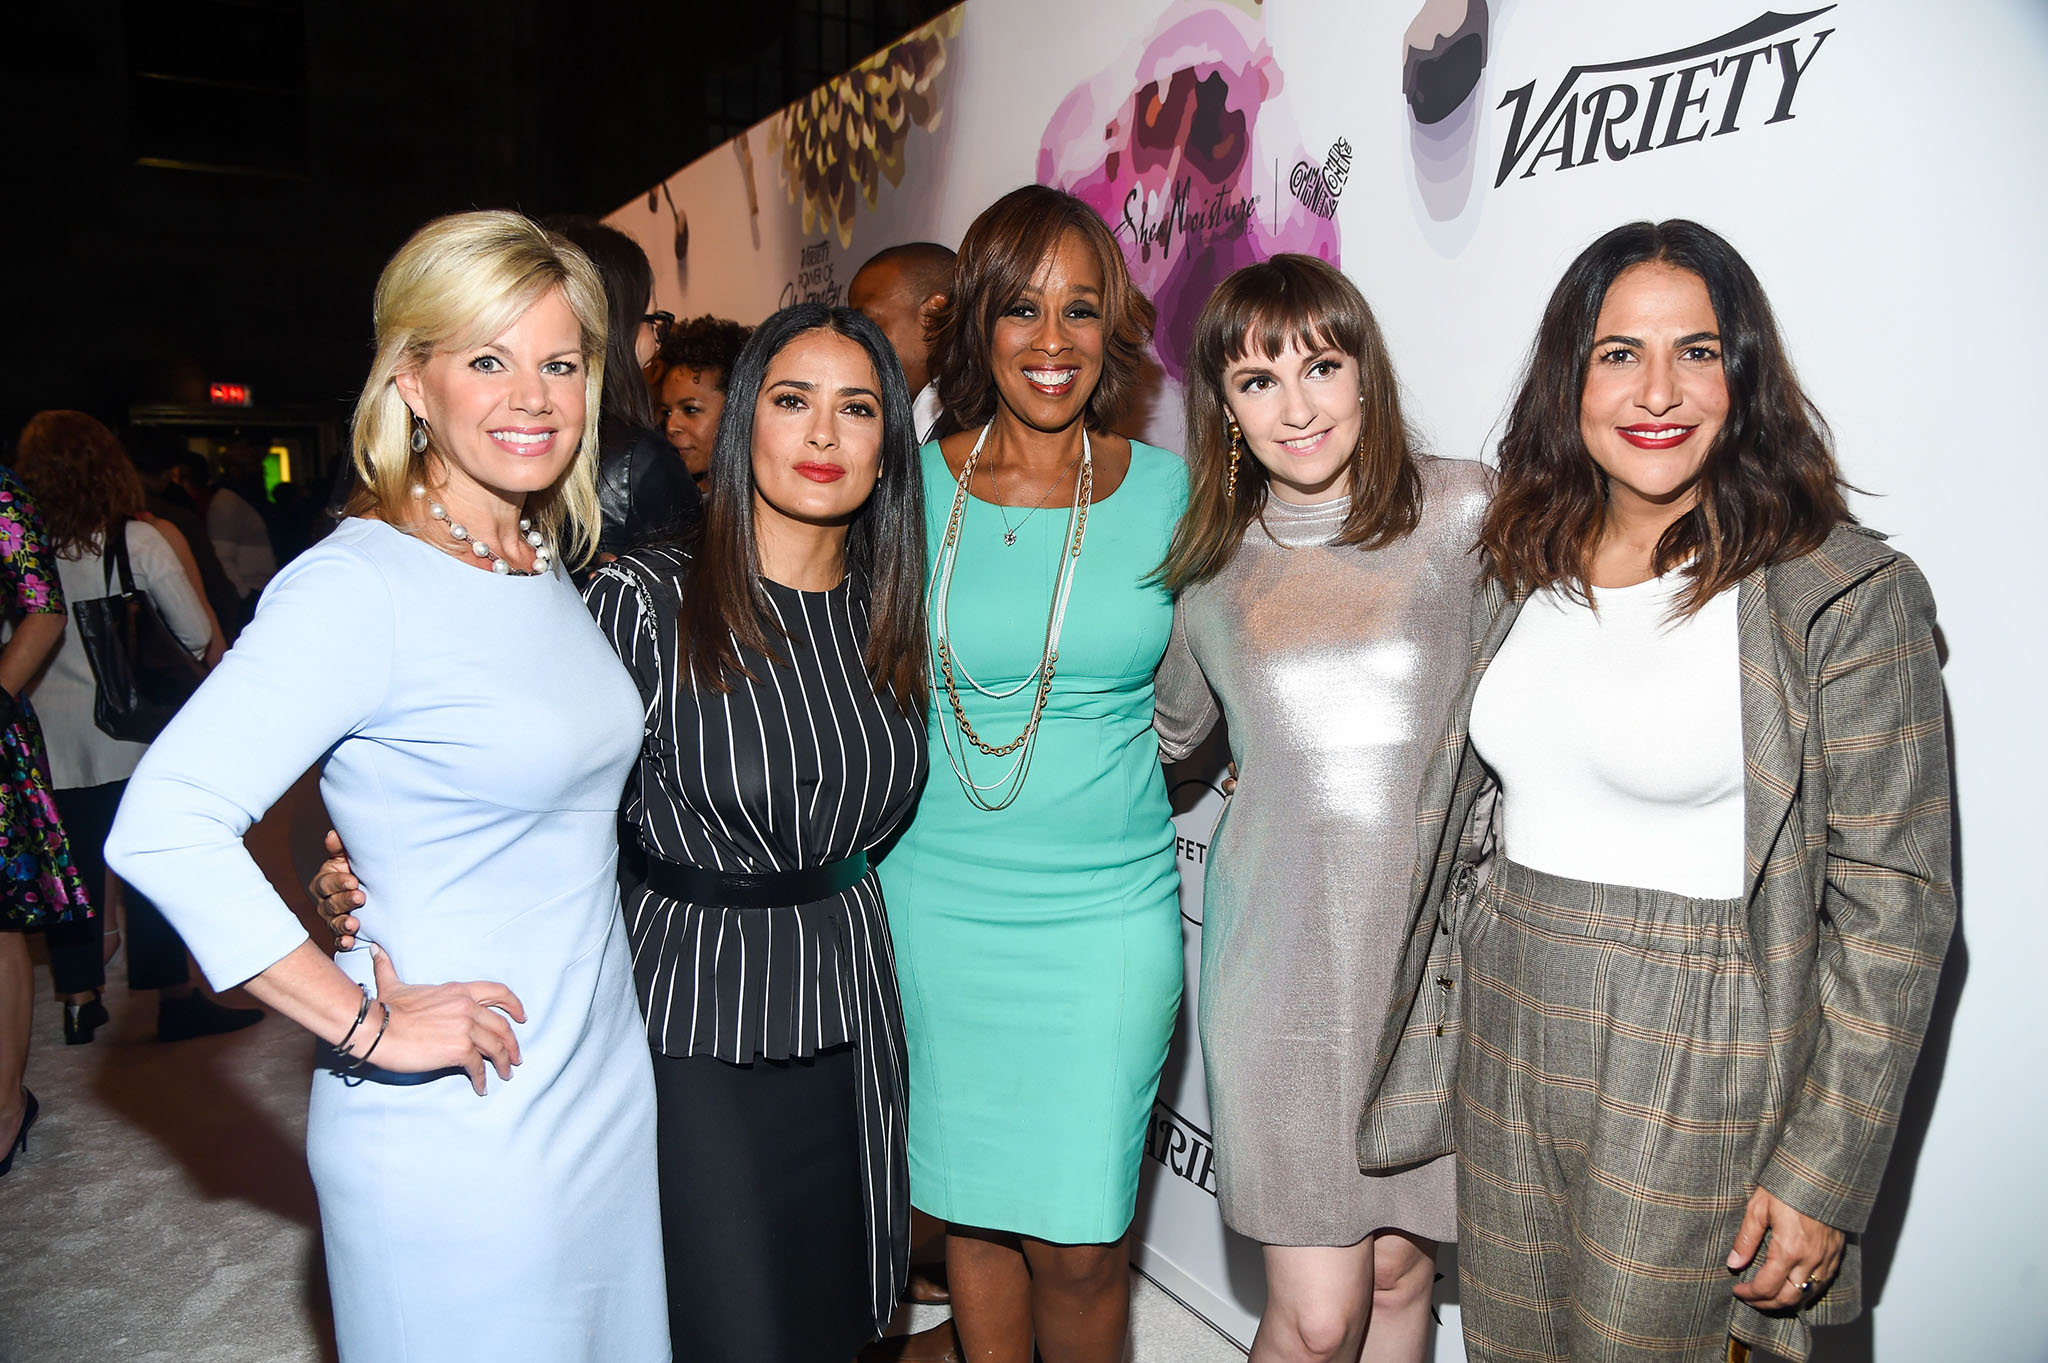 Gretchen Carlson, Salma Hayek, Gayle King, Lena Dunham, Jenni KonnerVariety's Power of Women NY Presented by Lifetime, Inside, Cipriani Midtown, New York, USA - 21 Apr 2017